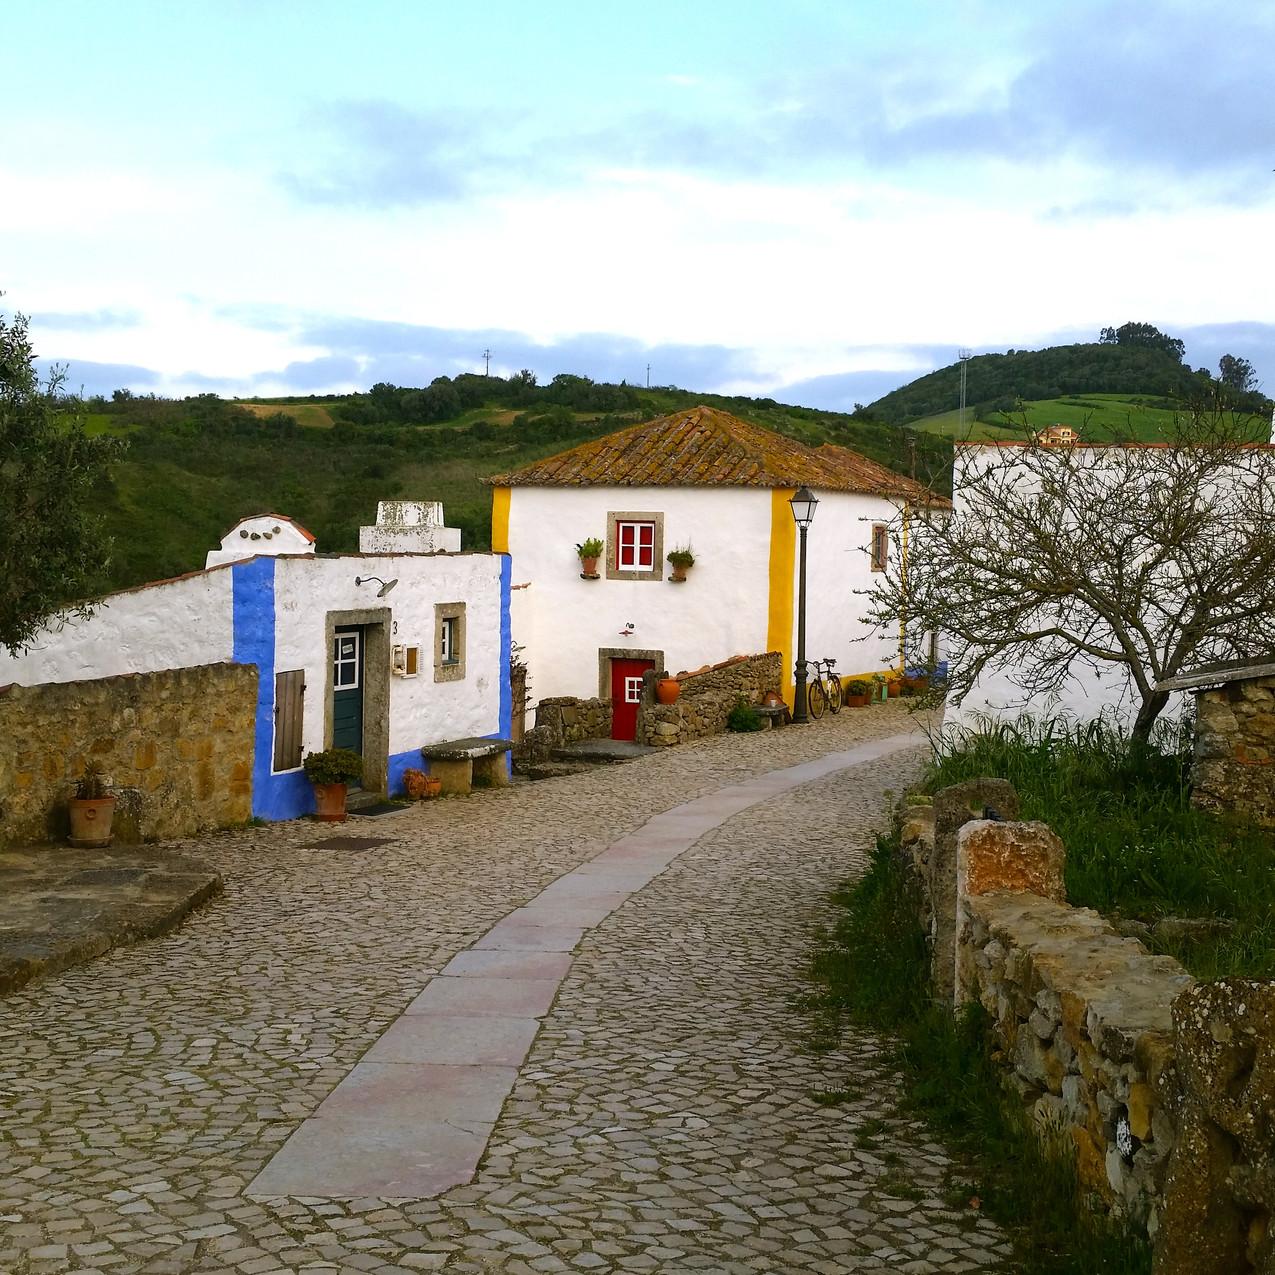 Casa Do Vinho (Winery House)